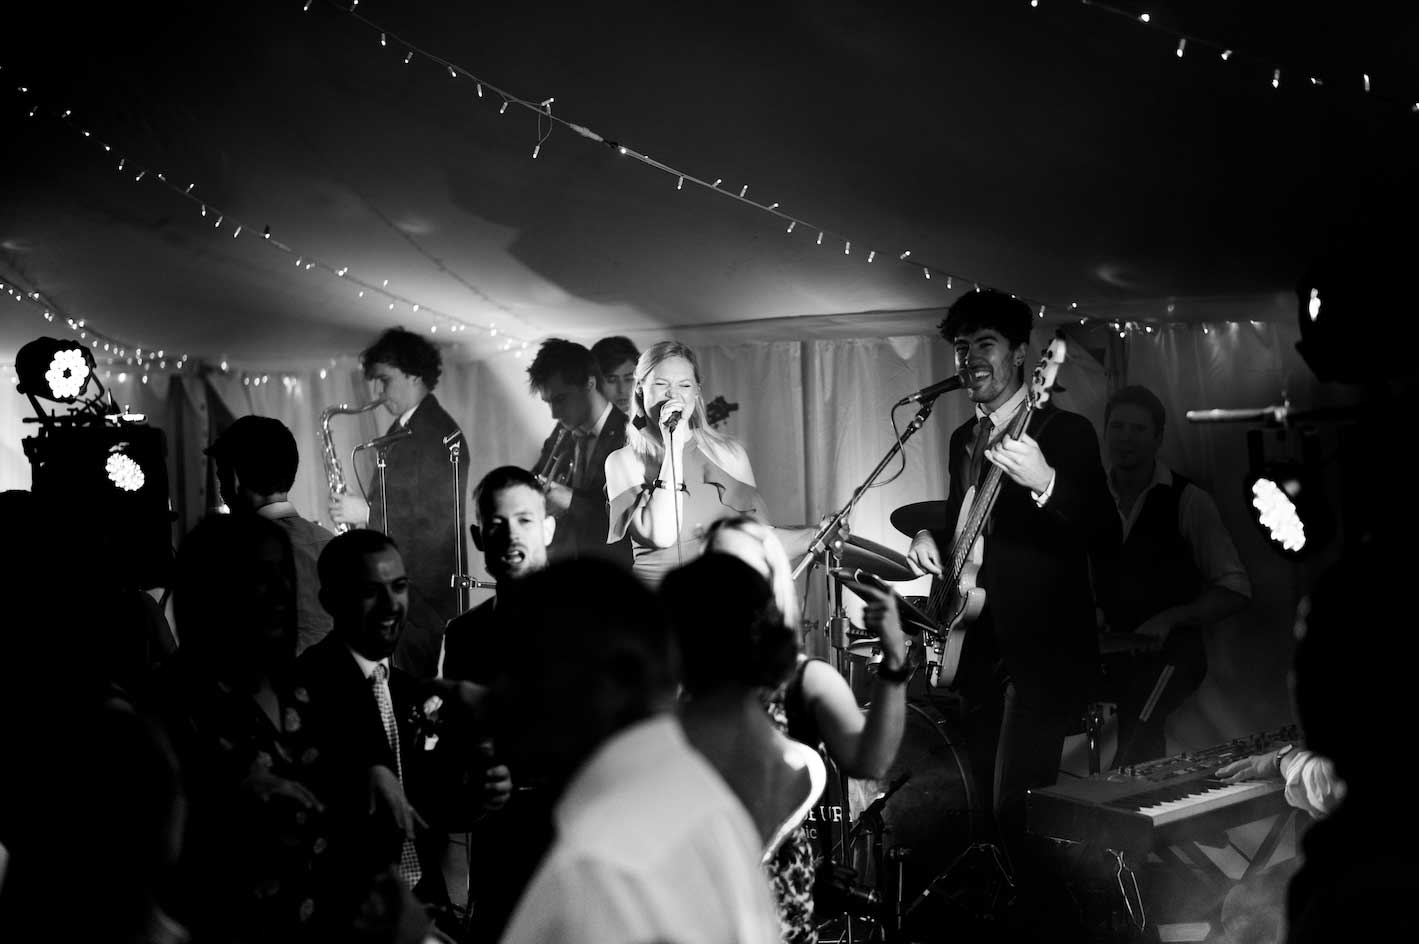 Top 10 tips to consider when hiring a wedding band